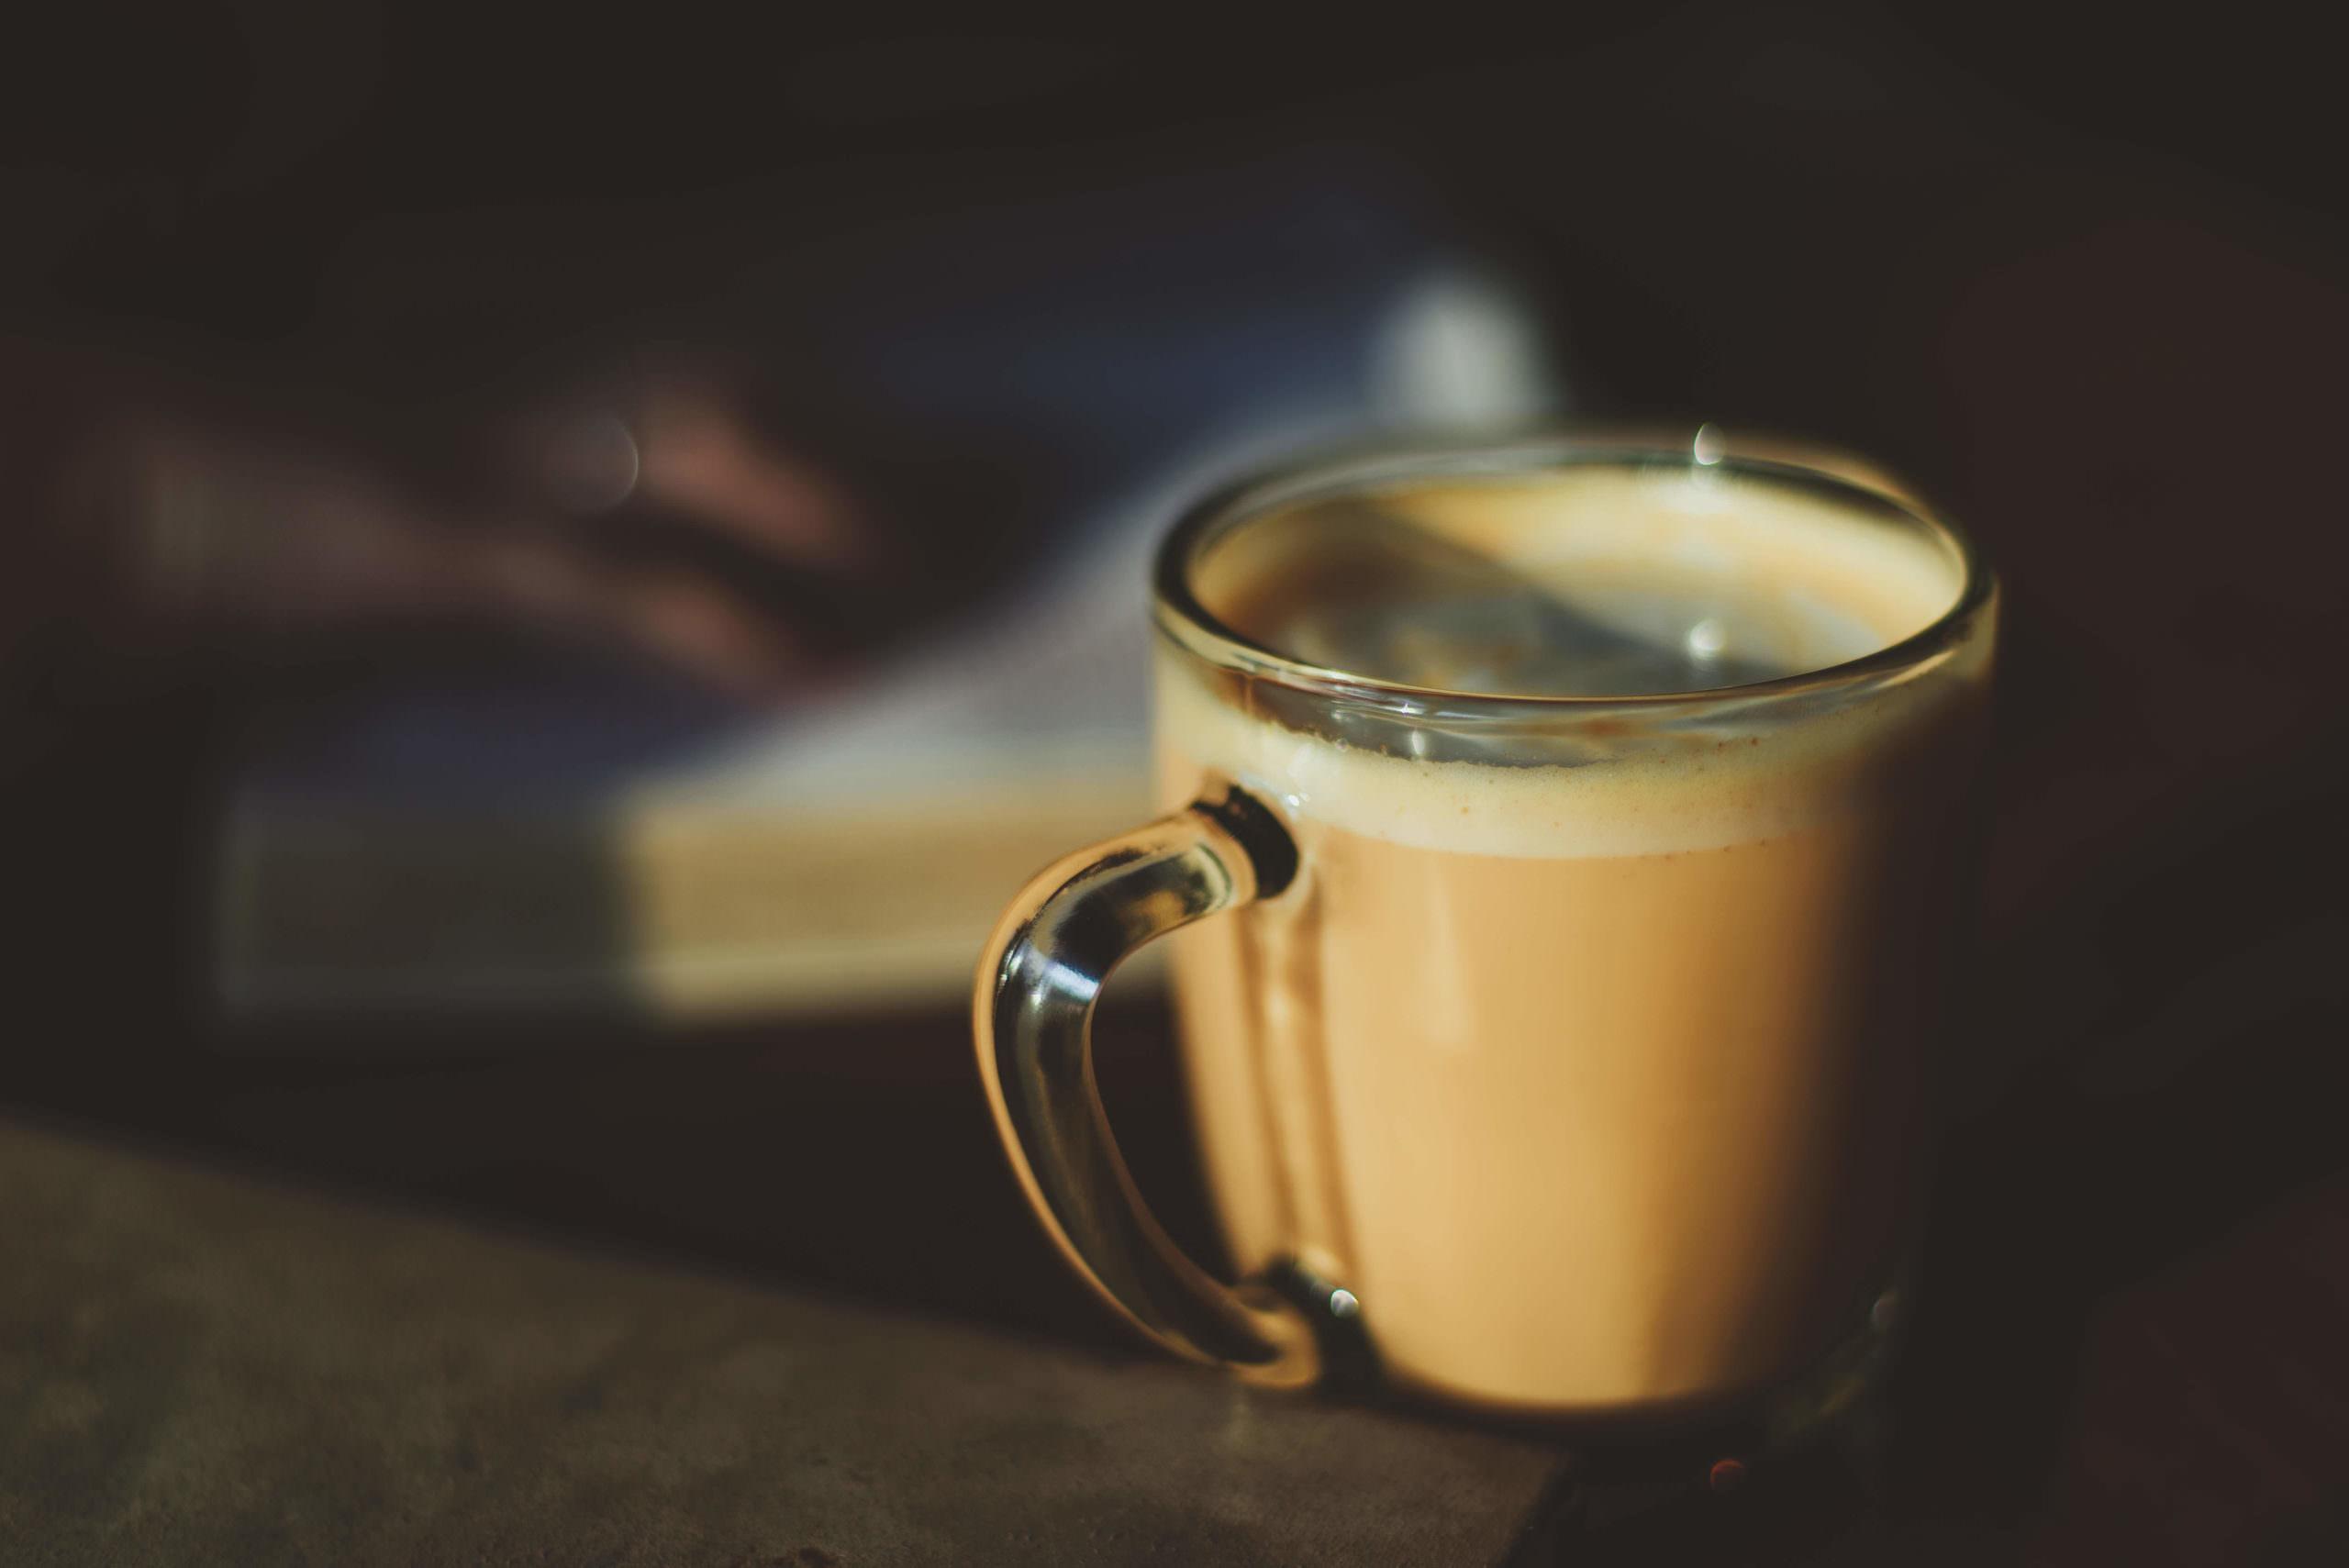 Effect of Caffeine on Health